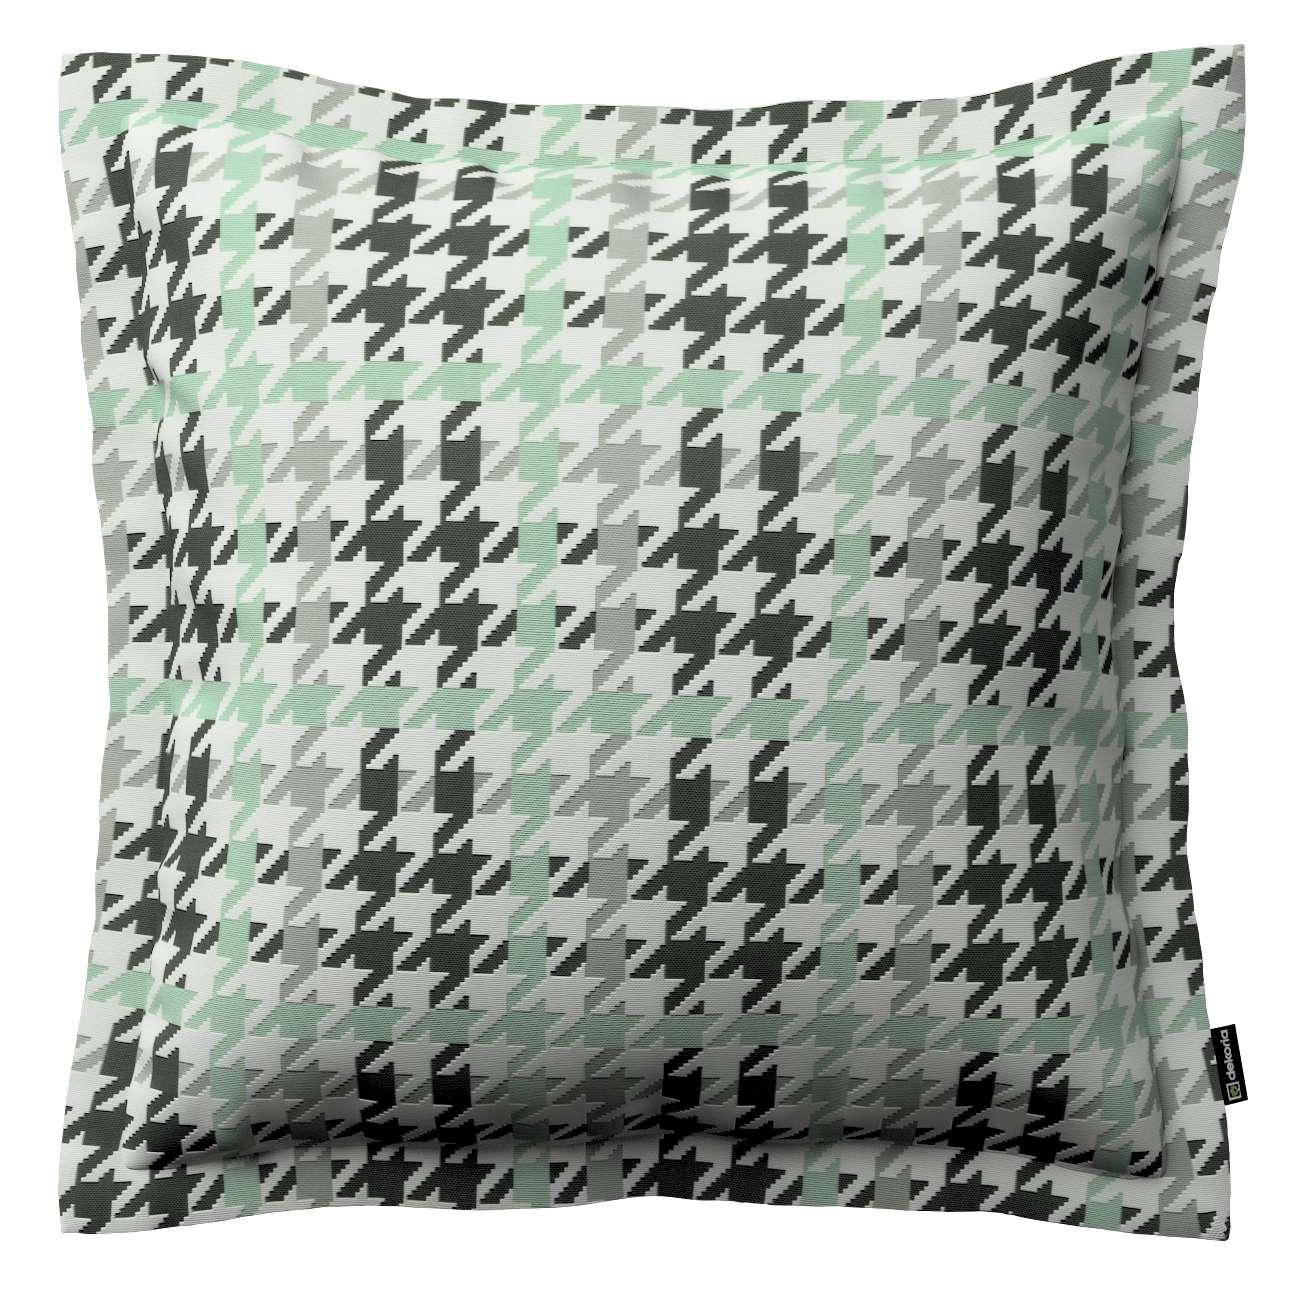 Poszewka Mona na poduszkę w kolekcji Brooklyn, tkanina: 137-77